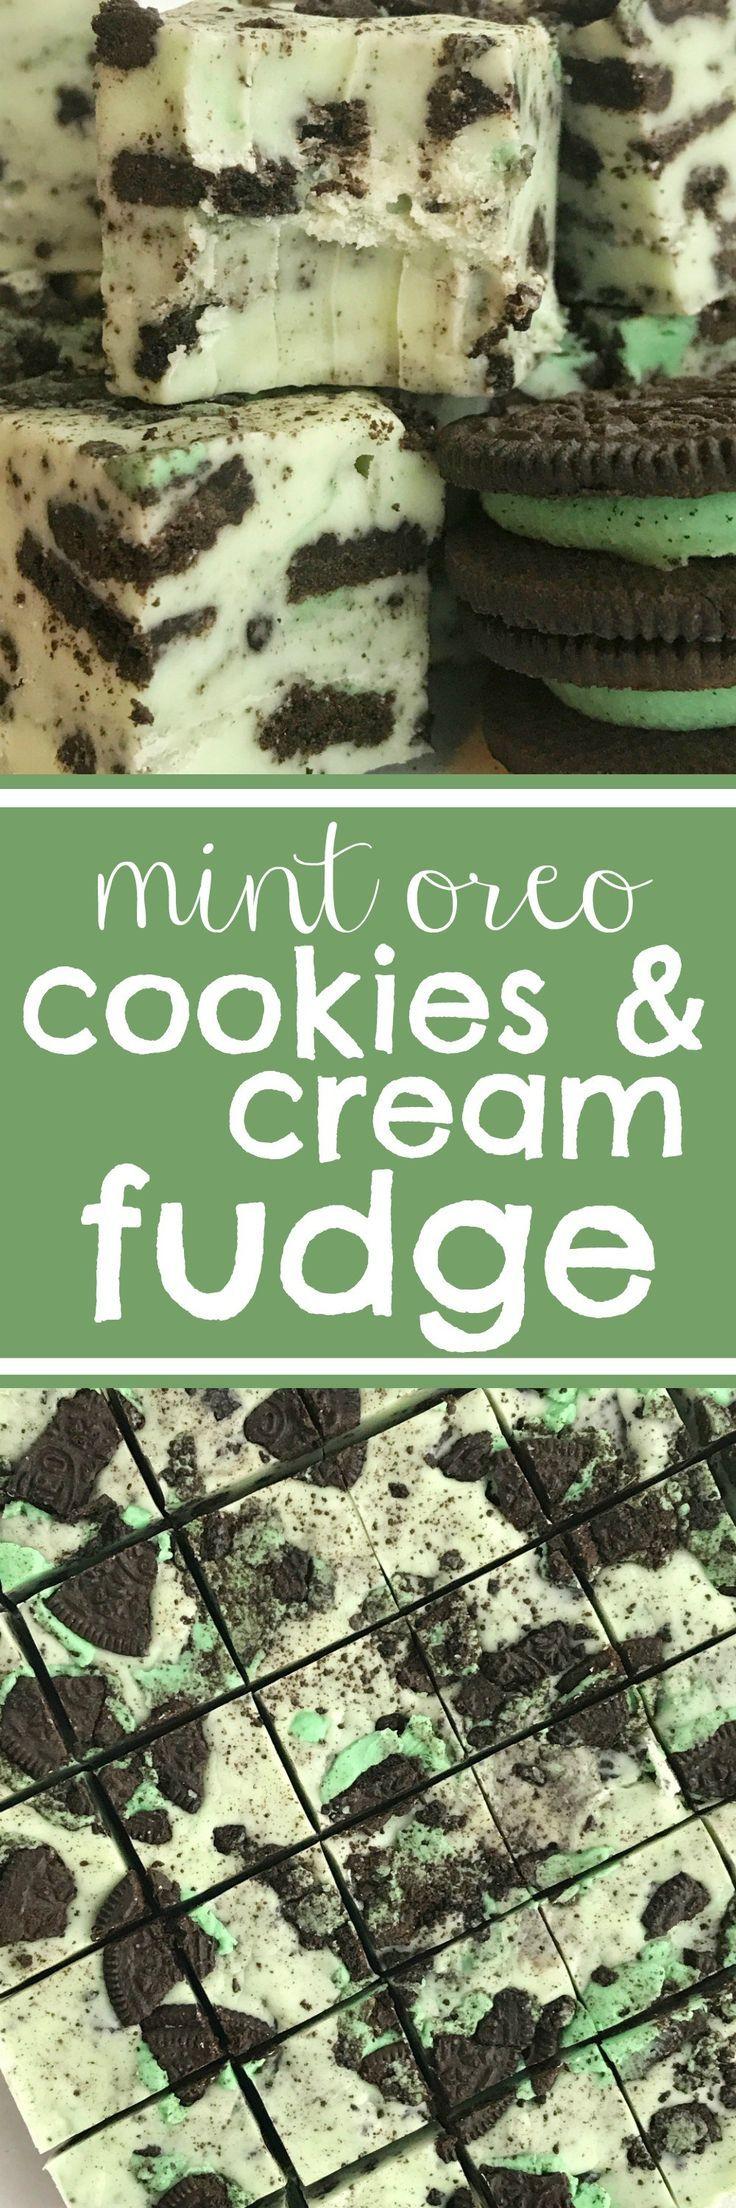 Fudge | Mint | Mint Fudge | Christmas Recipes | Christmas Candy |Mint Oreos | Oreos | Dessert | www.togetherasfamily.com #mintrecipes #christmasrecipes #christmascookies #fudgerecipes #fudge